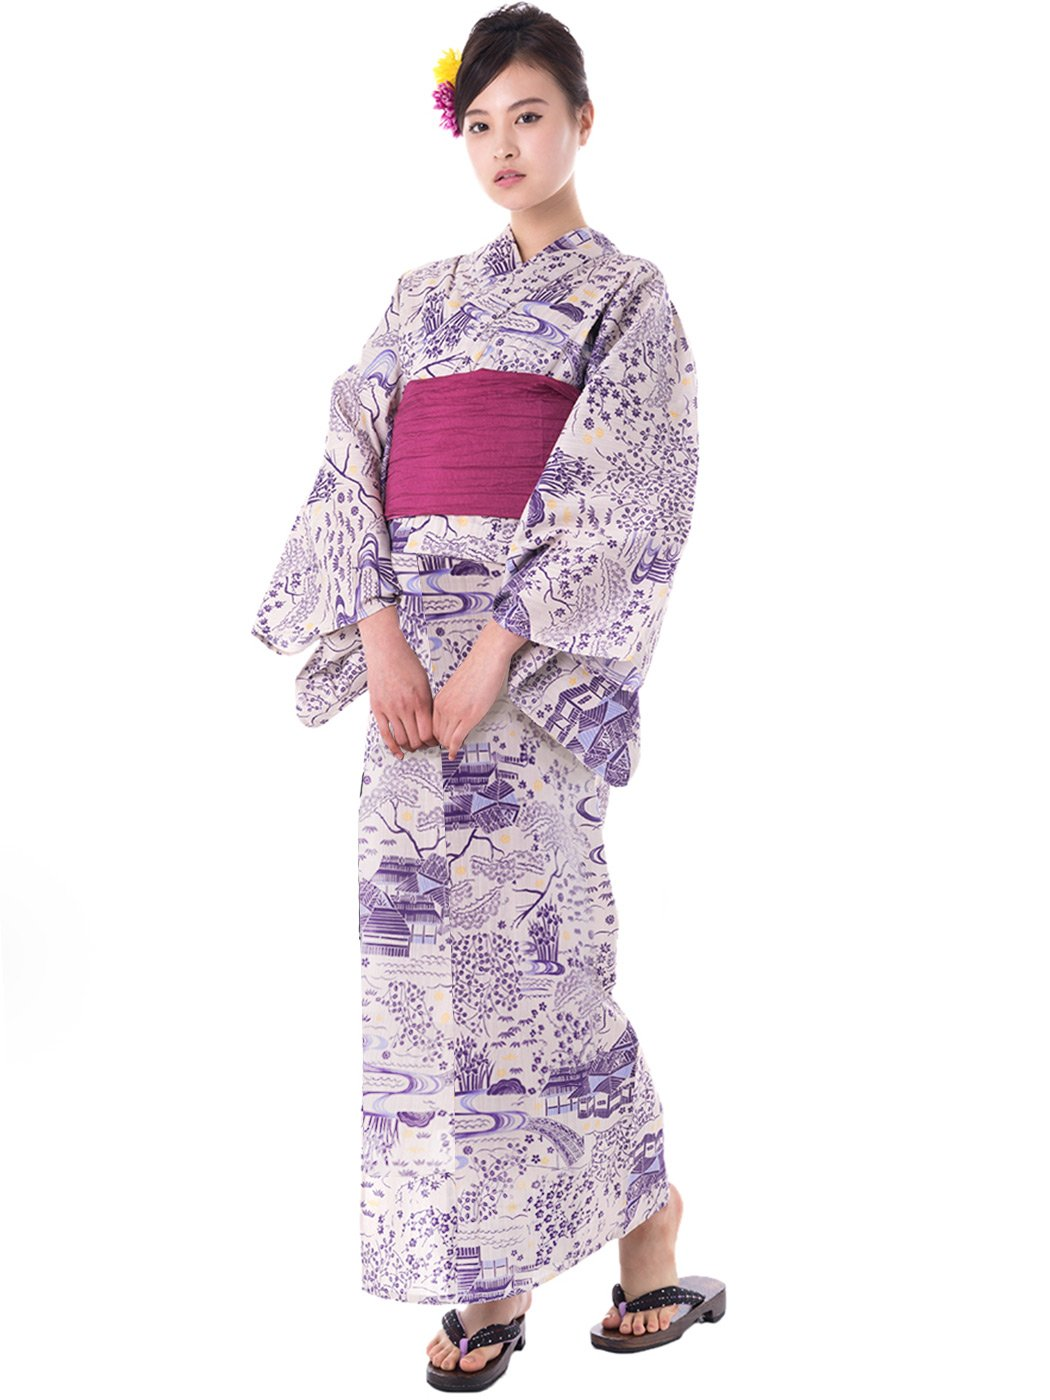 KYOETSU Women's Elegance Yukata 2 Piece Set (Yukata/Obi) (Small (Japan Size TL), FM-4(Obi Wine Red))